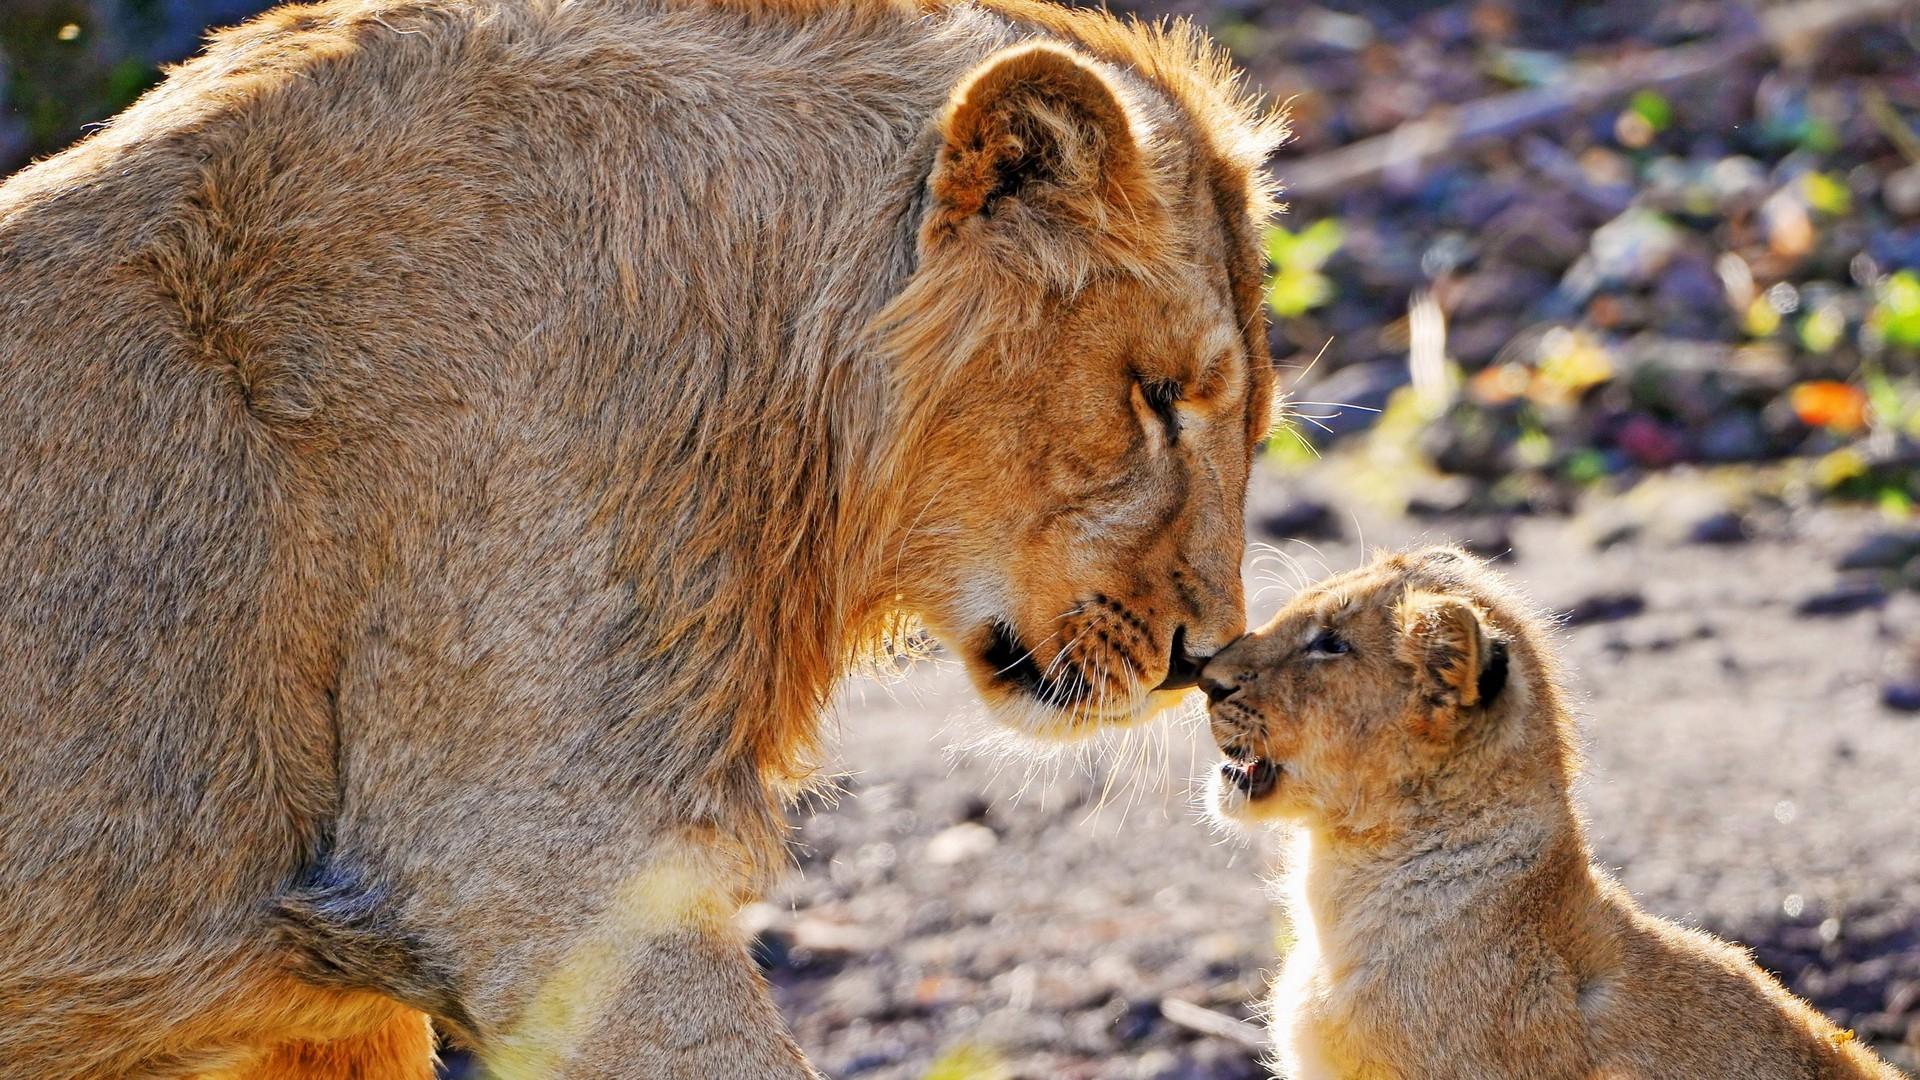 wallpaper : nature, lion, wildlife, big cats, zoo, safari, tender